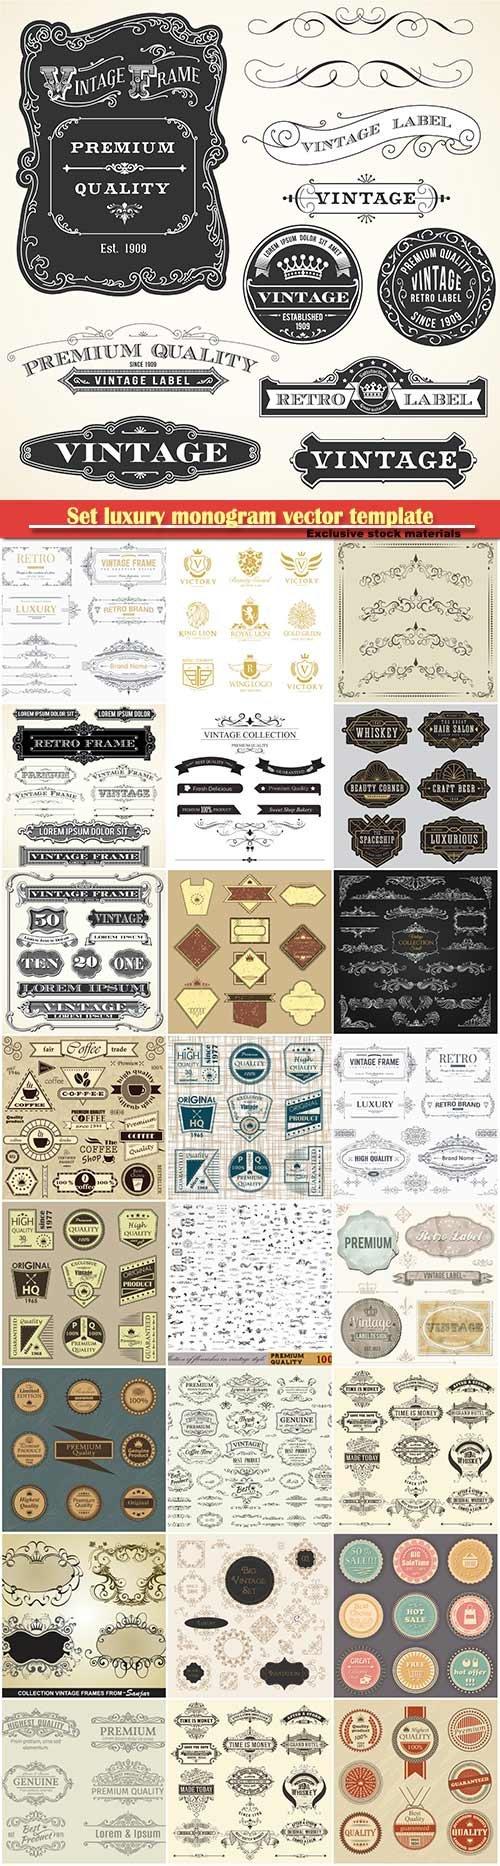 Set luxury monogram vector template, logos, badges, symbols # 10